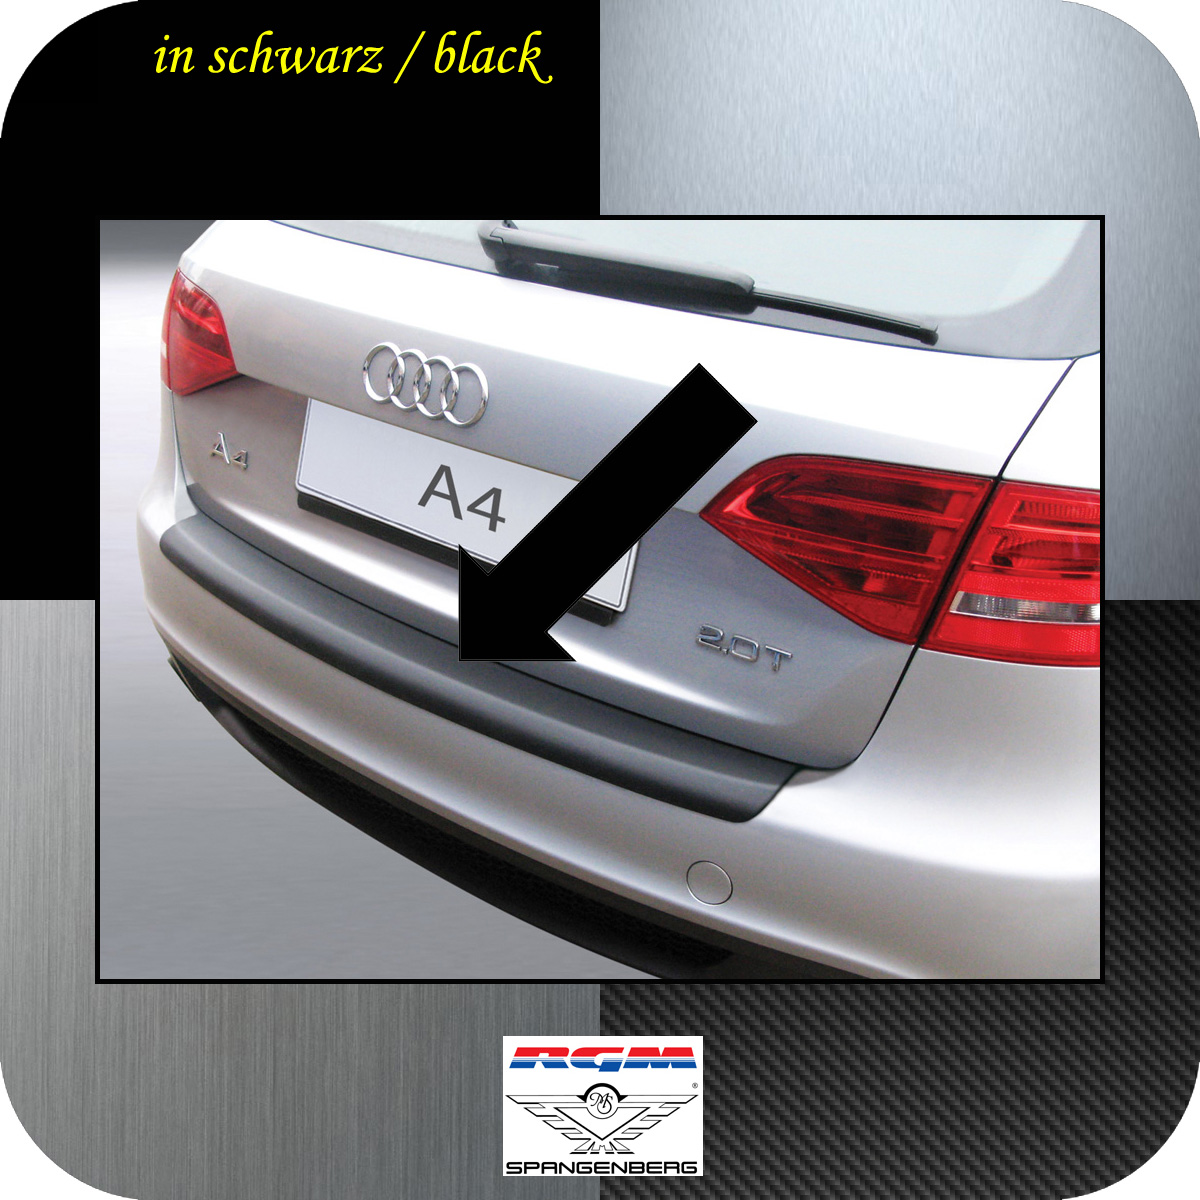 Ladekantenschutz schwarz Audi A4 B8 Avant Kombi vor facelift 2008-11 3500159